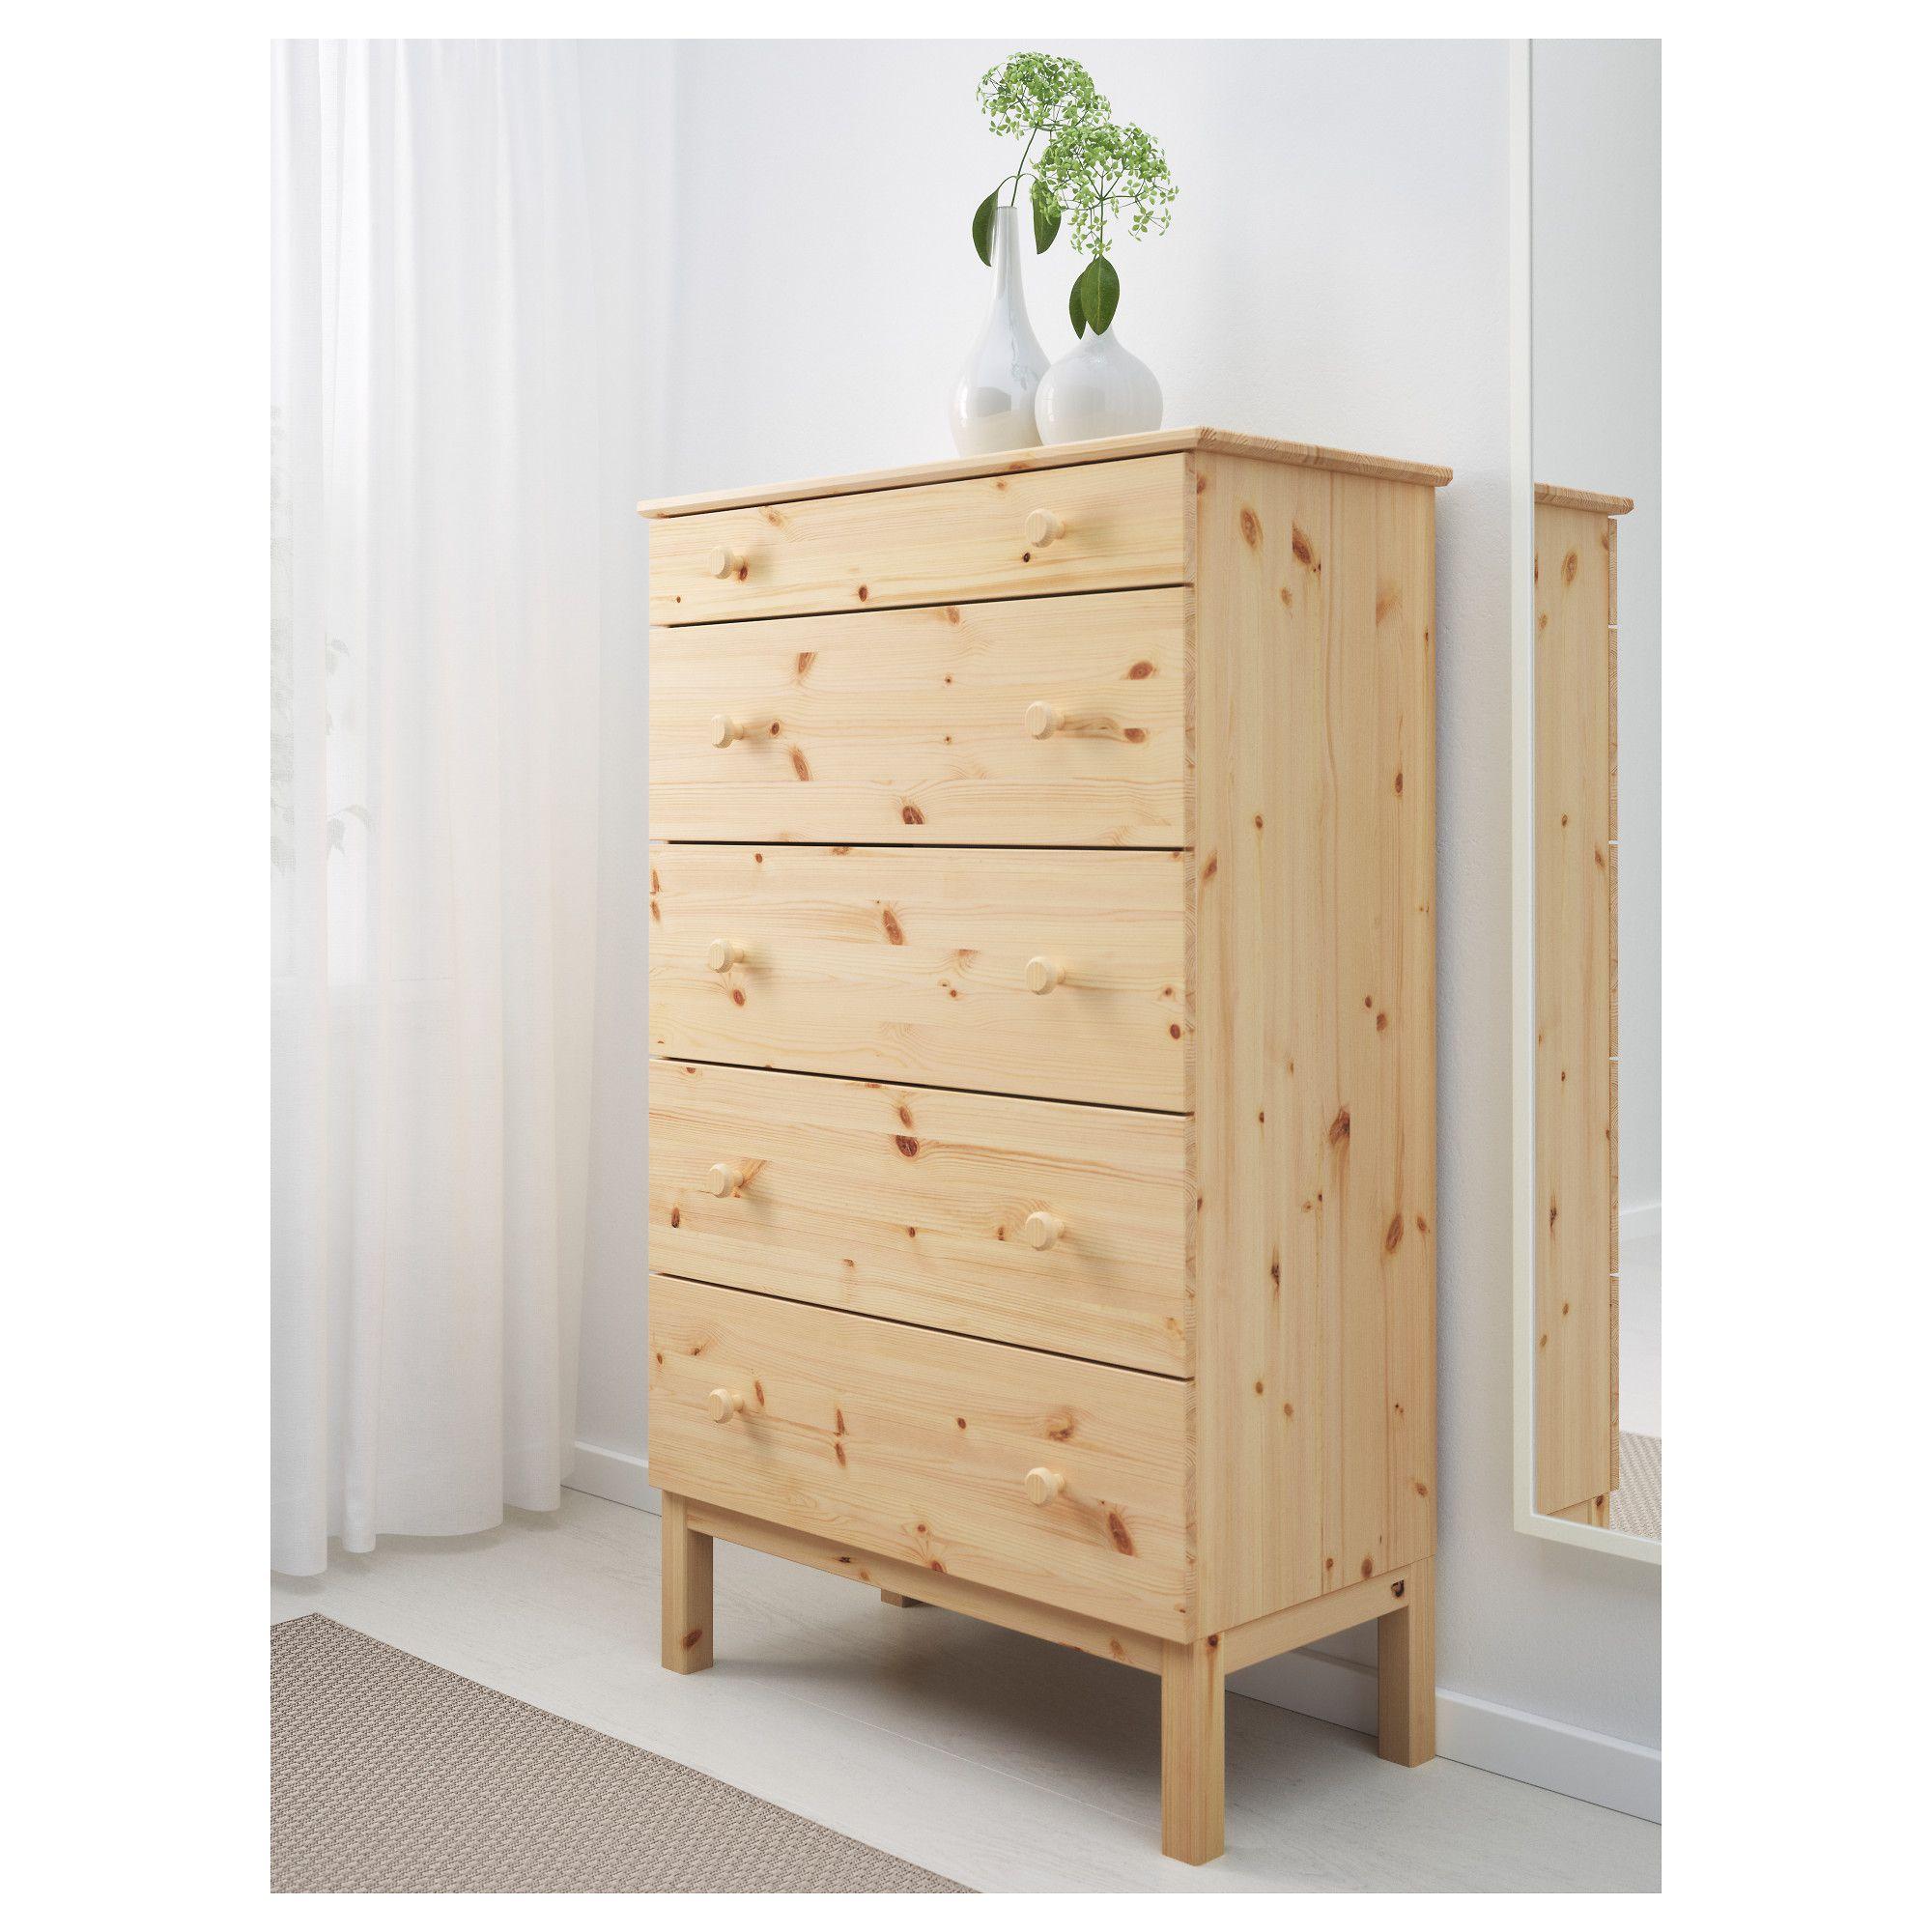 TARVA Komoda, 5 szuflad, sosna   Pine, Drawers and Bedrooms